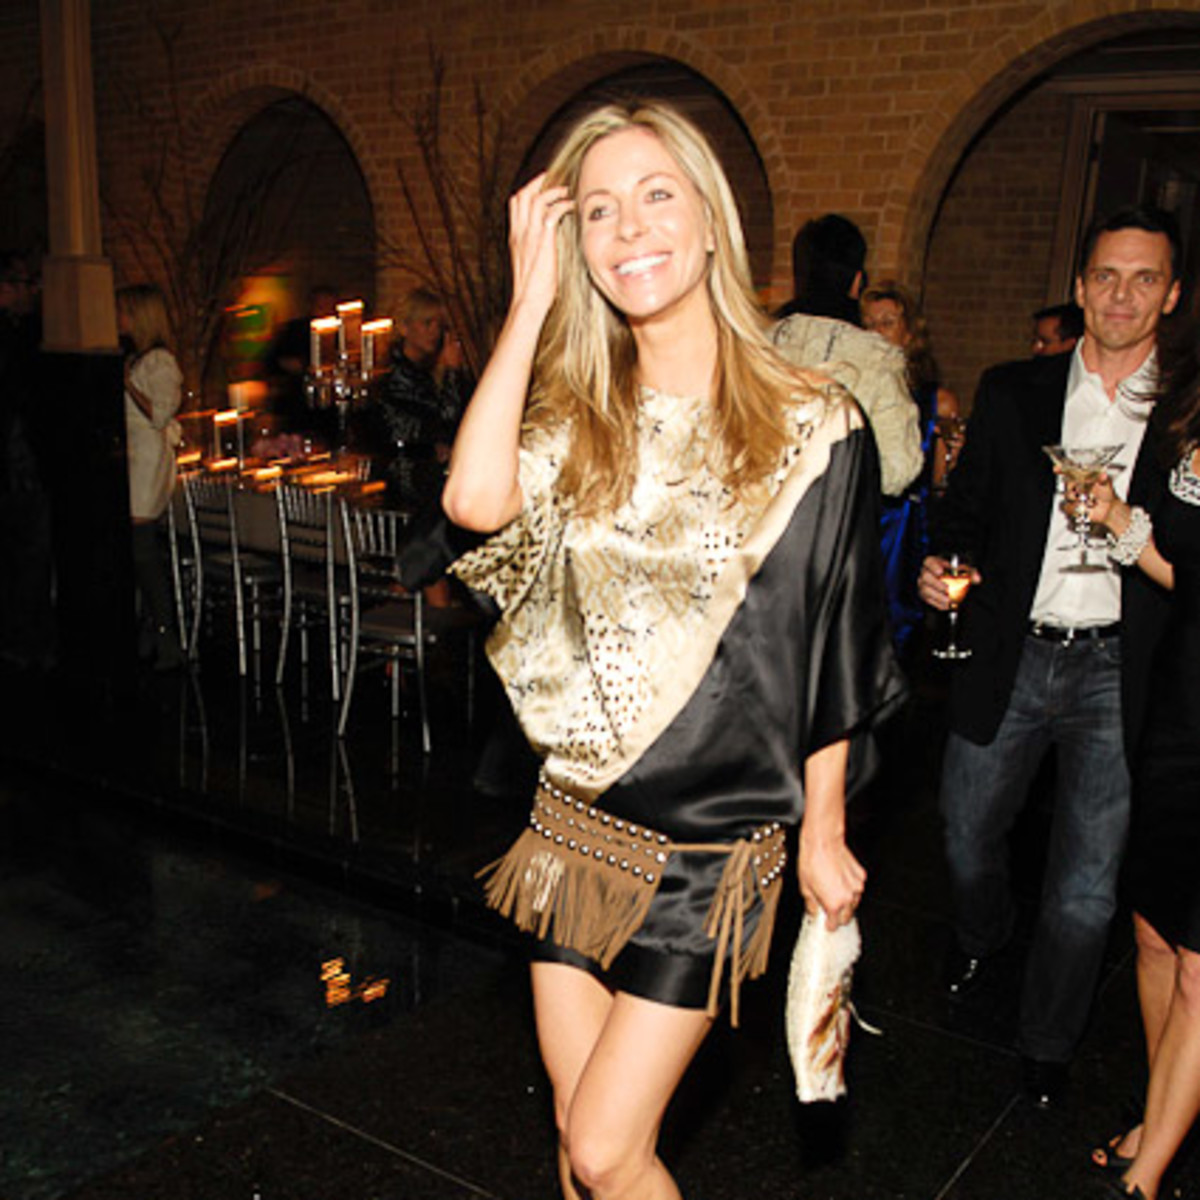 News_Vogue at Becca_Feb. 2010_Laura Casey